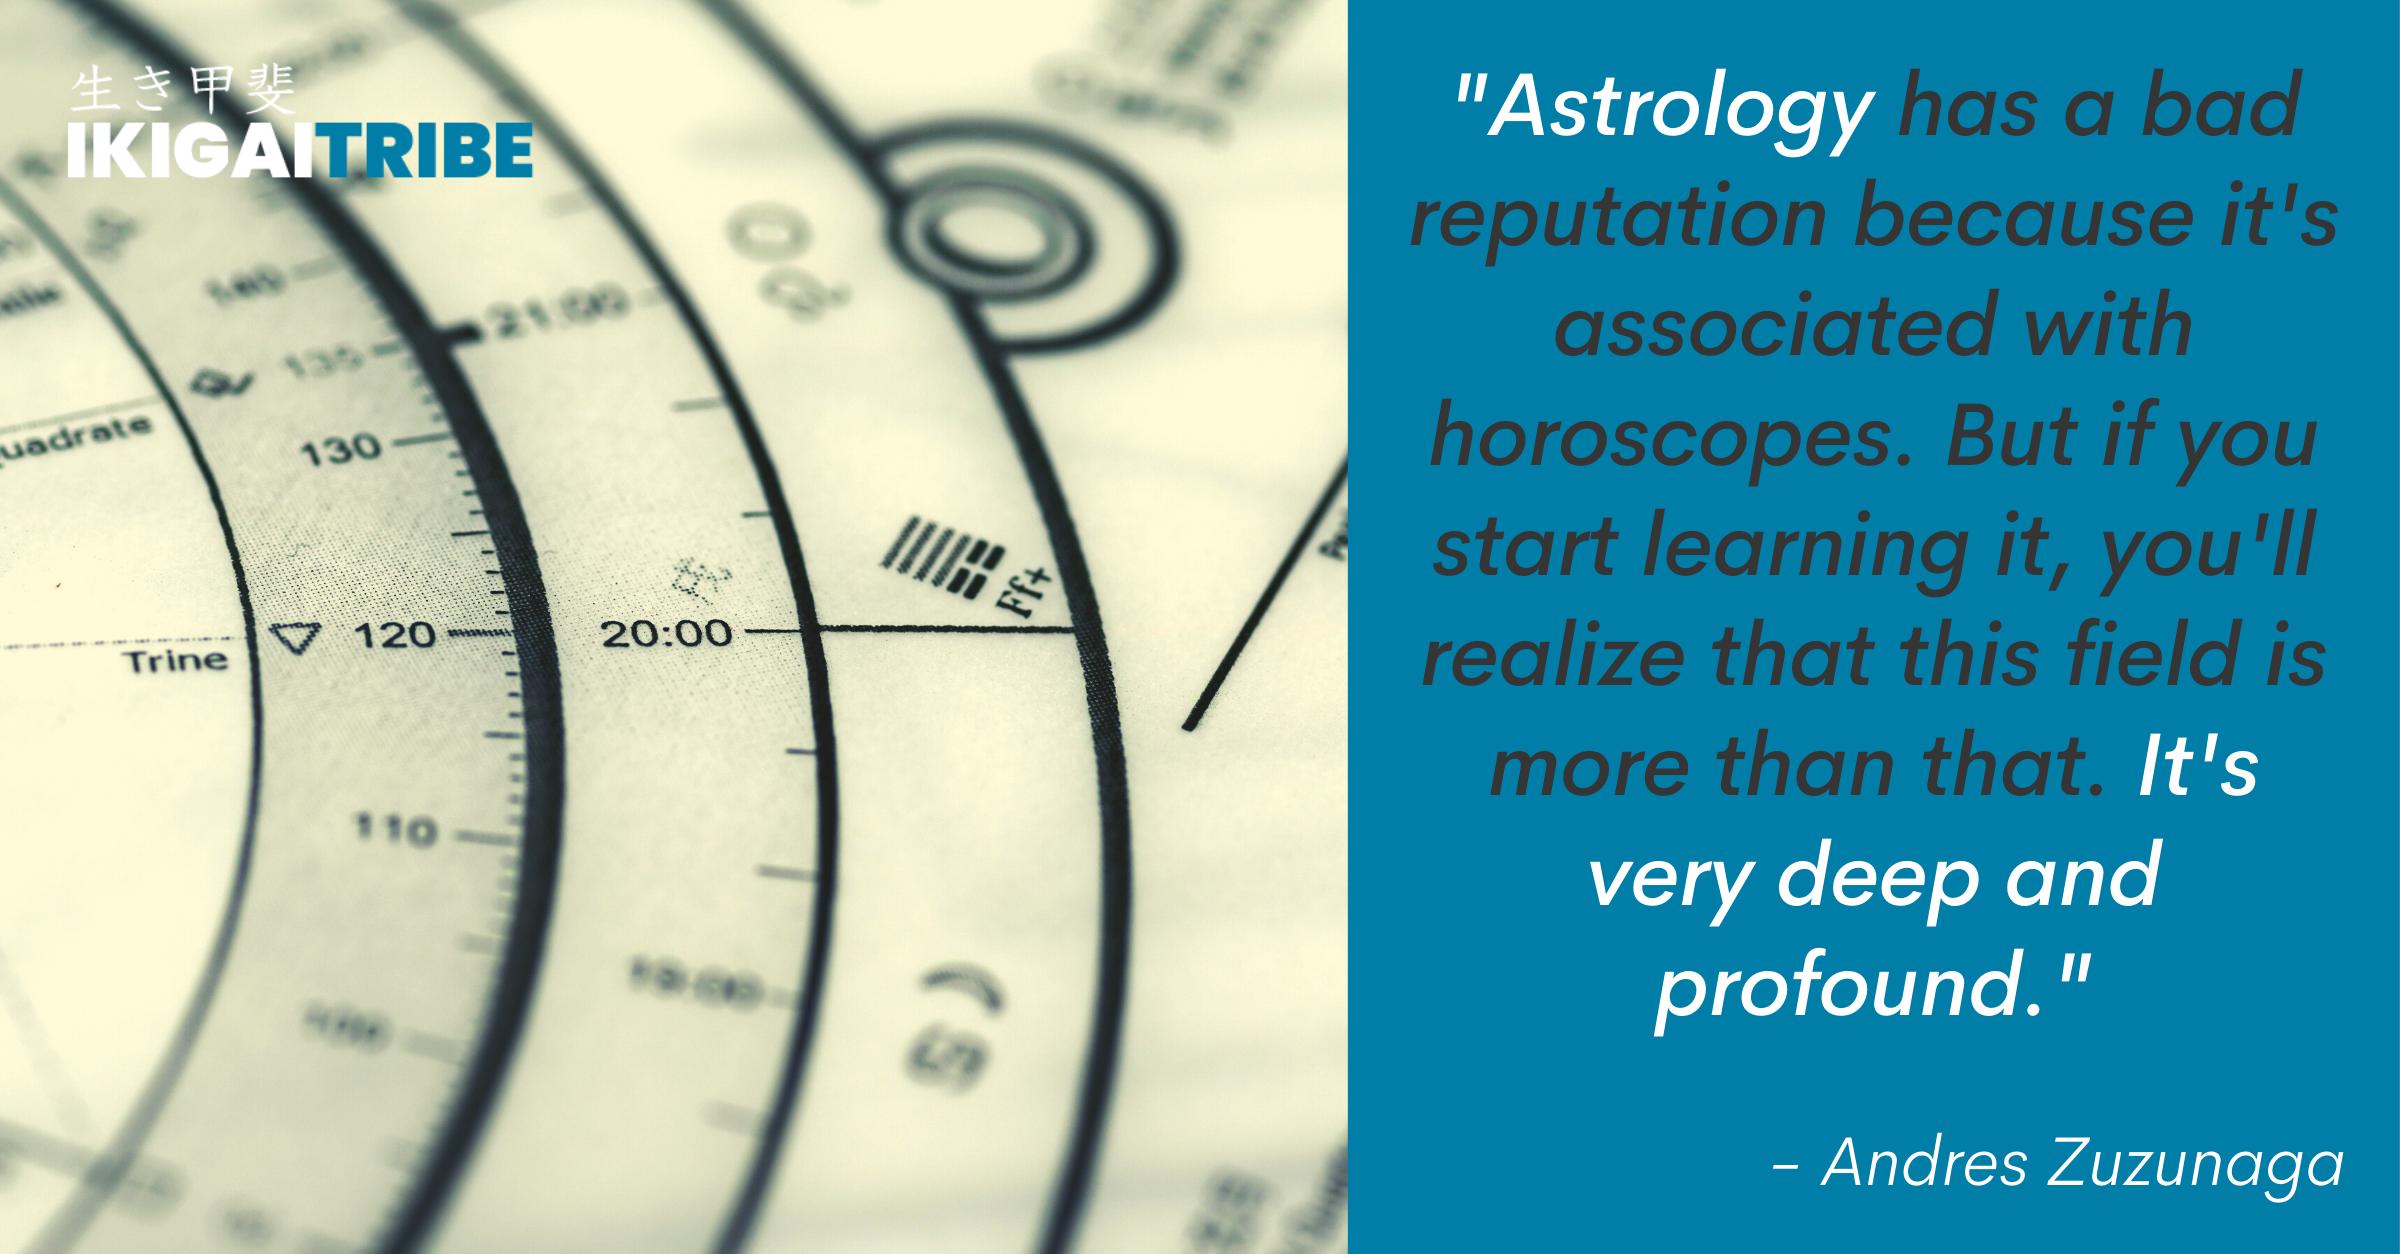 Zuzunaga's Astrology Vision